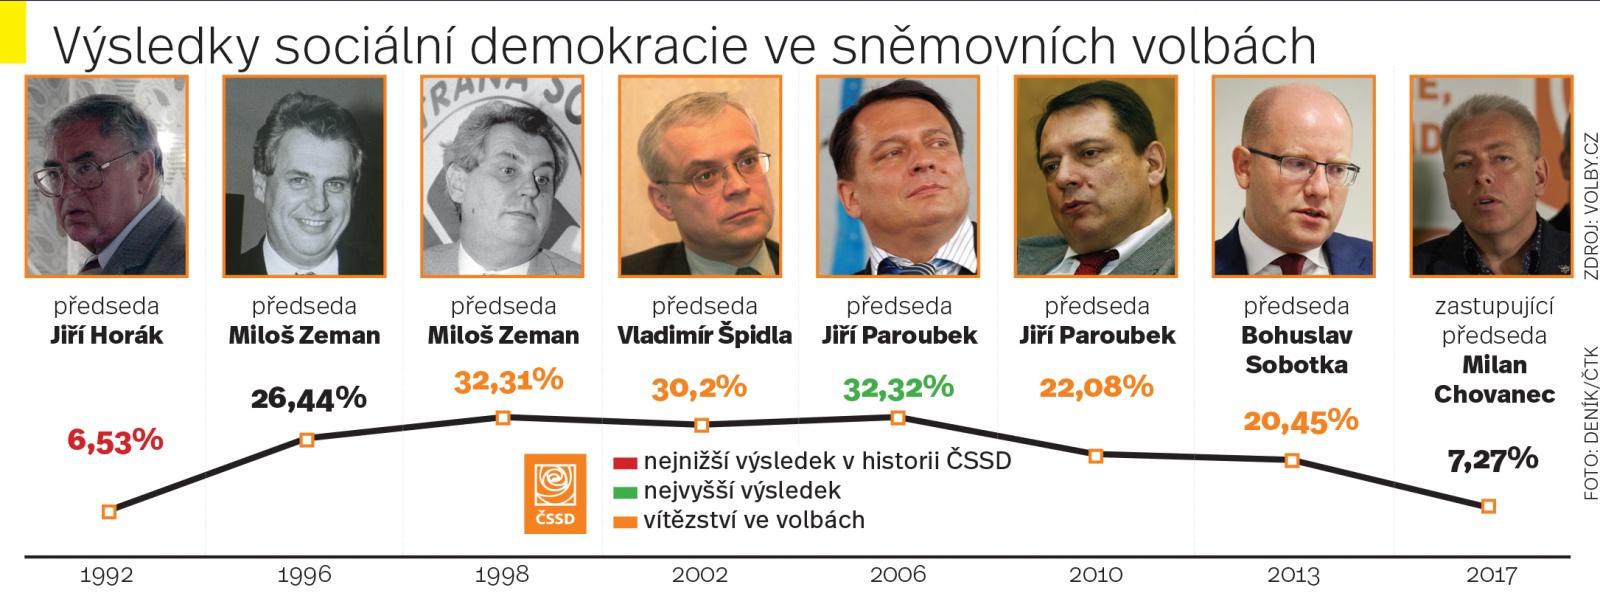 https://g.denik.cz/1/8a/0611-cssd-vysledky.jpg